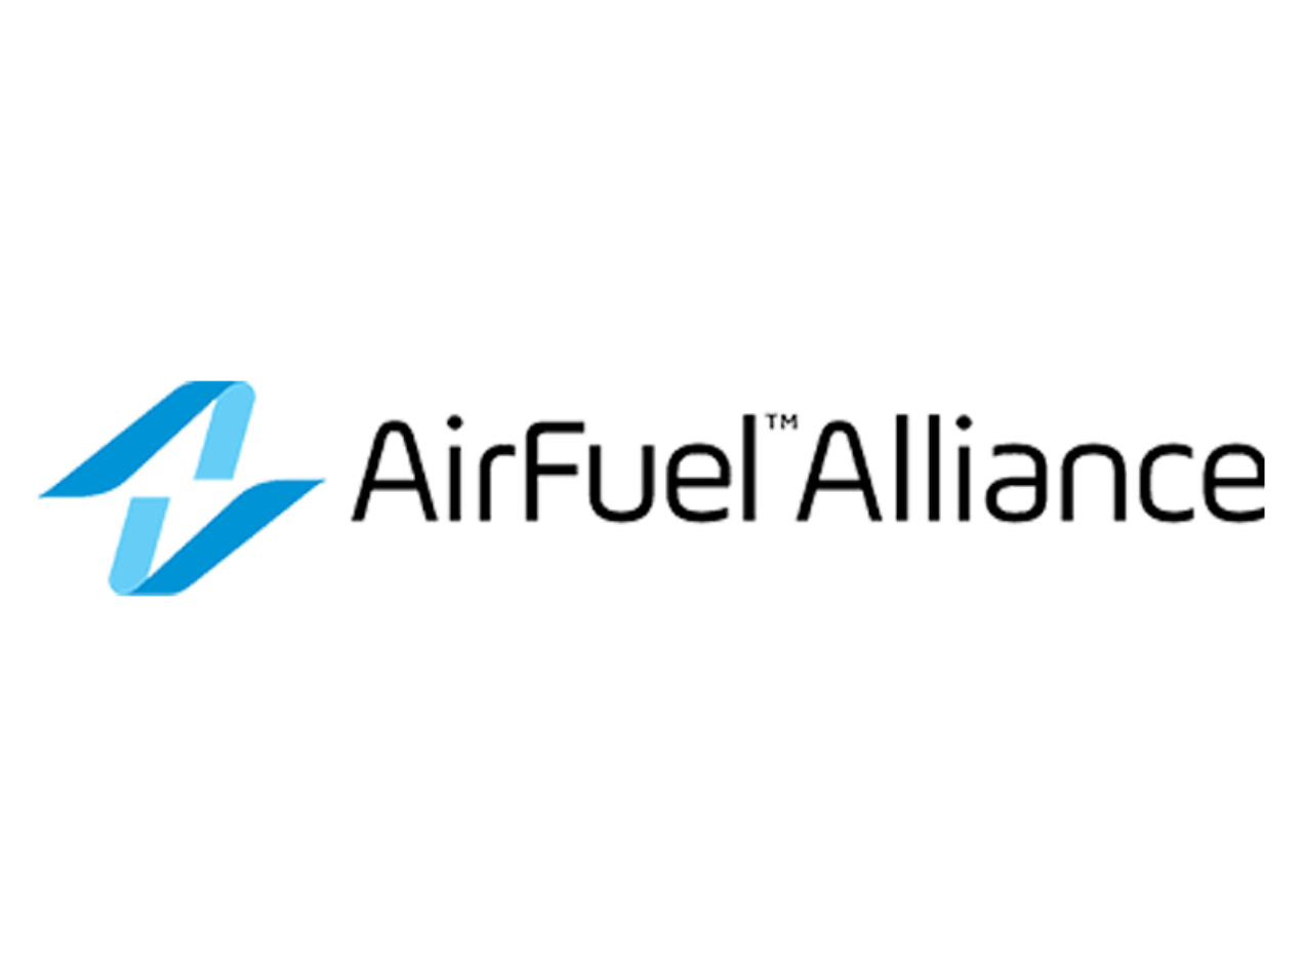 Airfuel alliance large